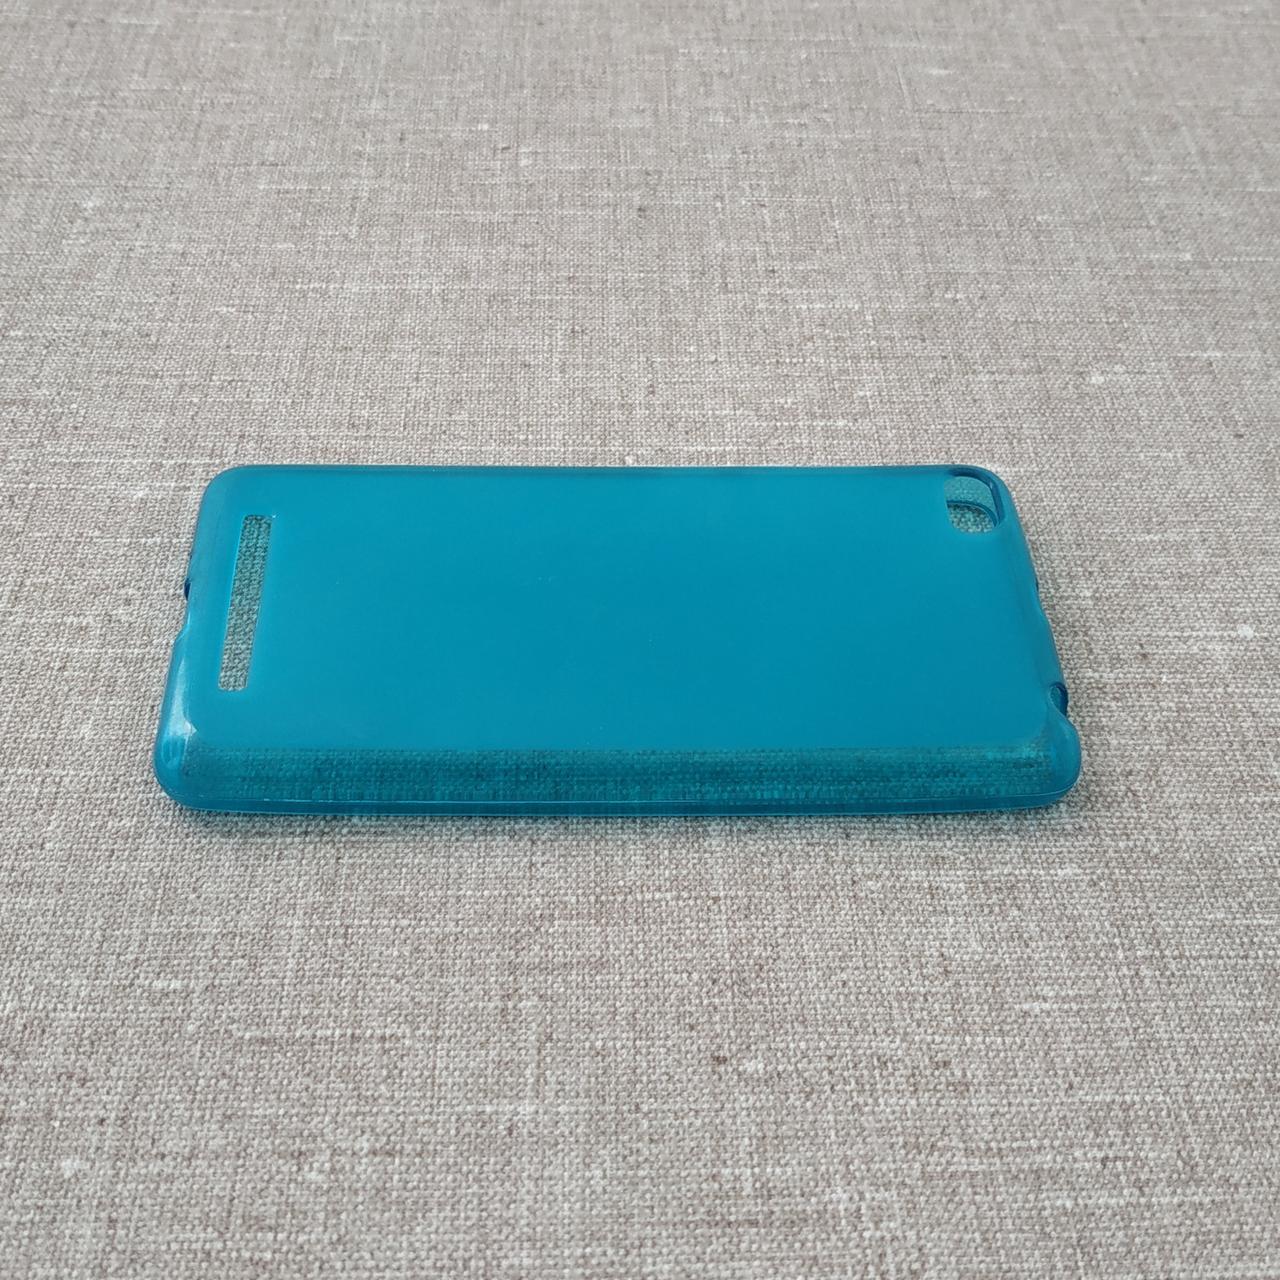 Чехлы для Xiaomi Redmi 3 TPU blue